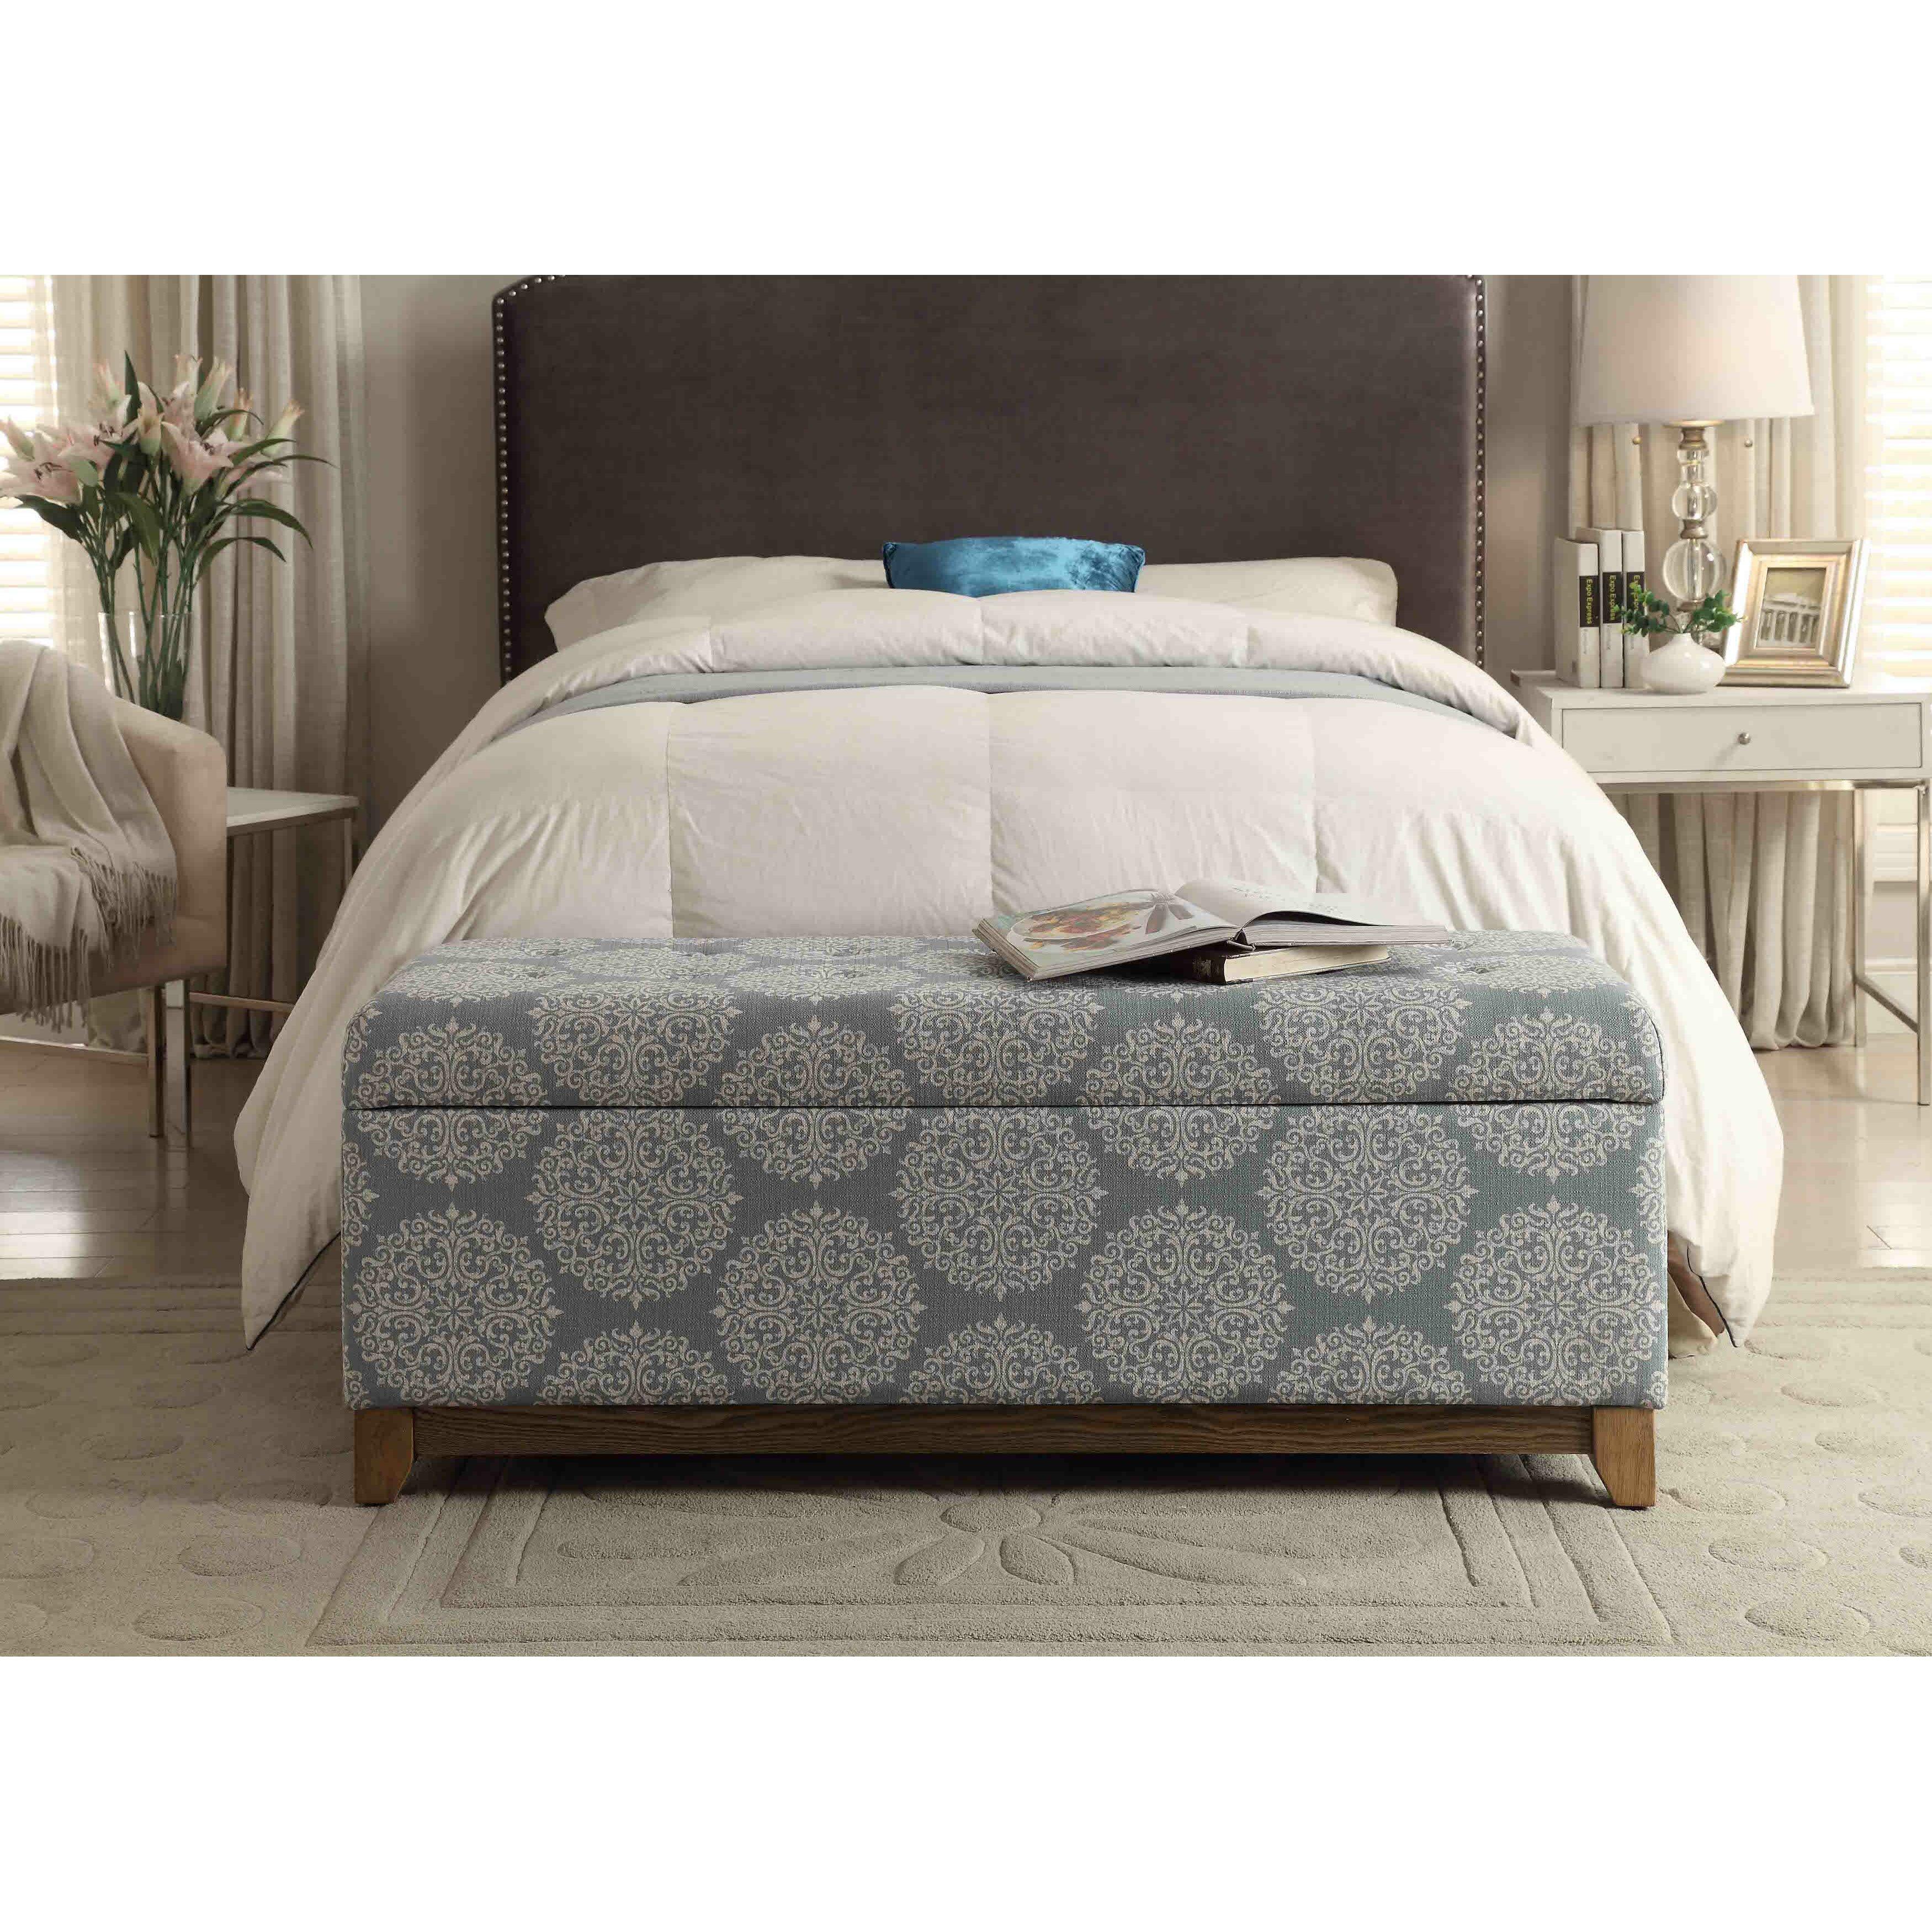 Bedroom Storage Benches: Bungalow Rose Navya Wood Storage Bedroom Bench & Reviews